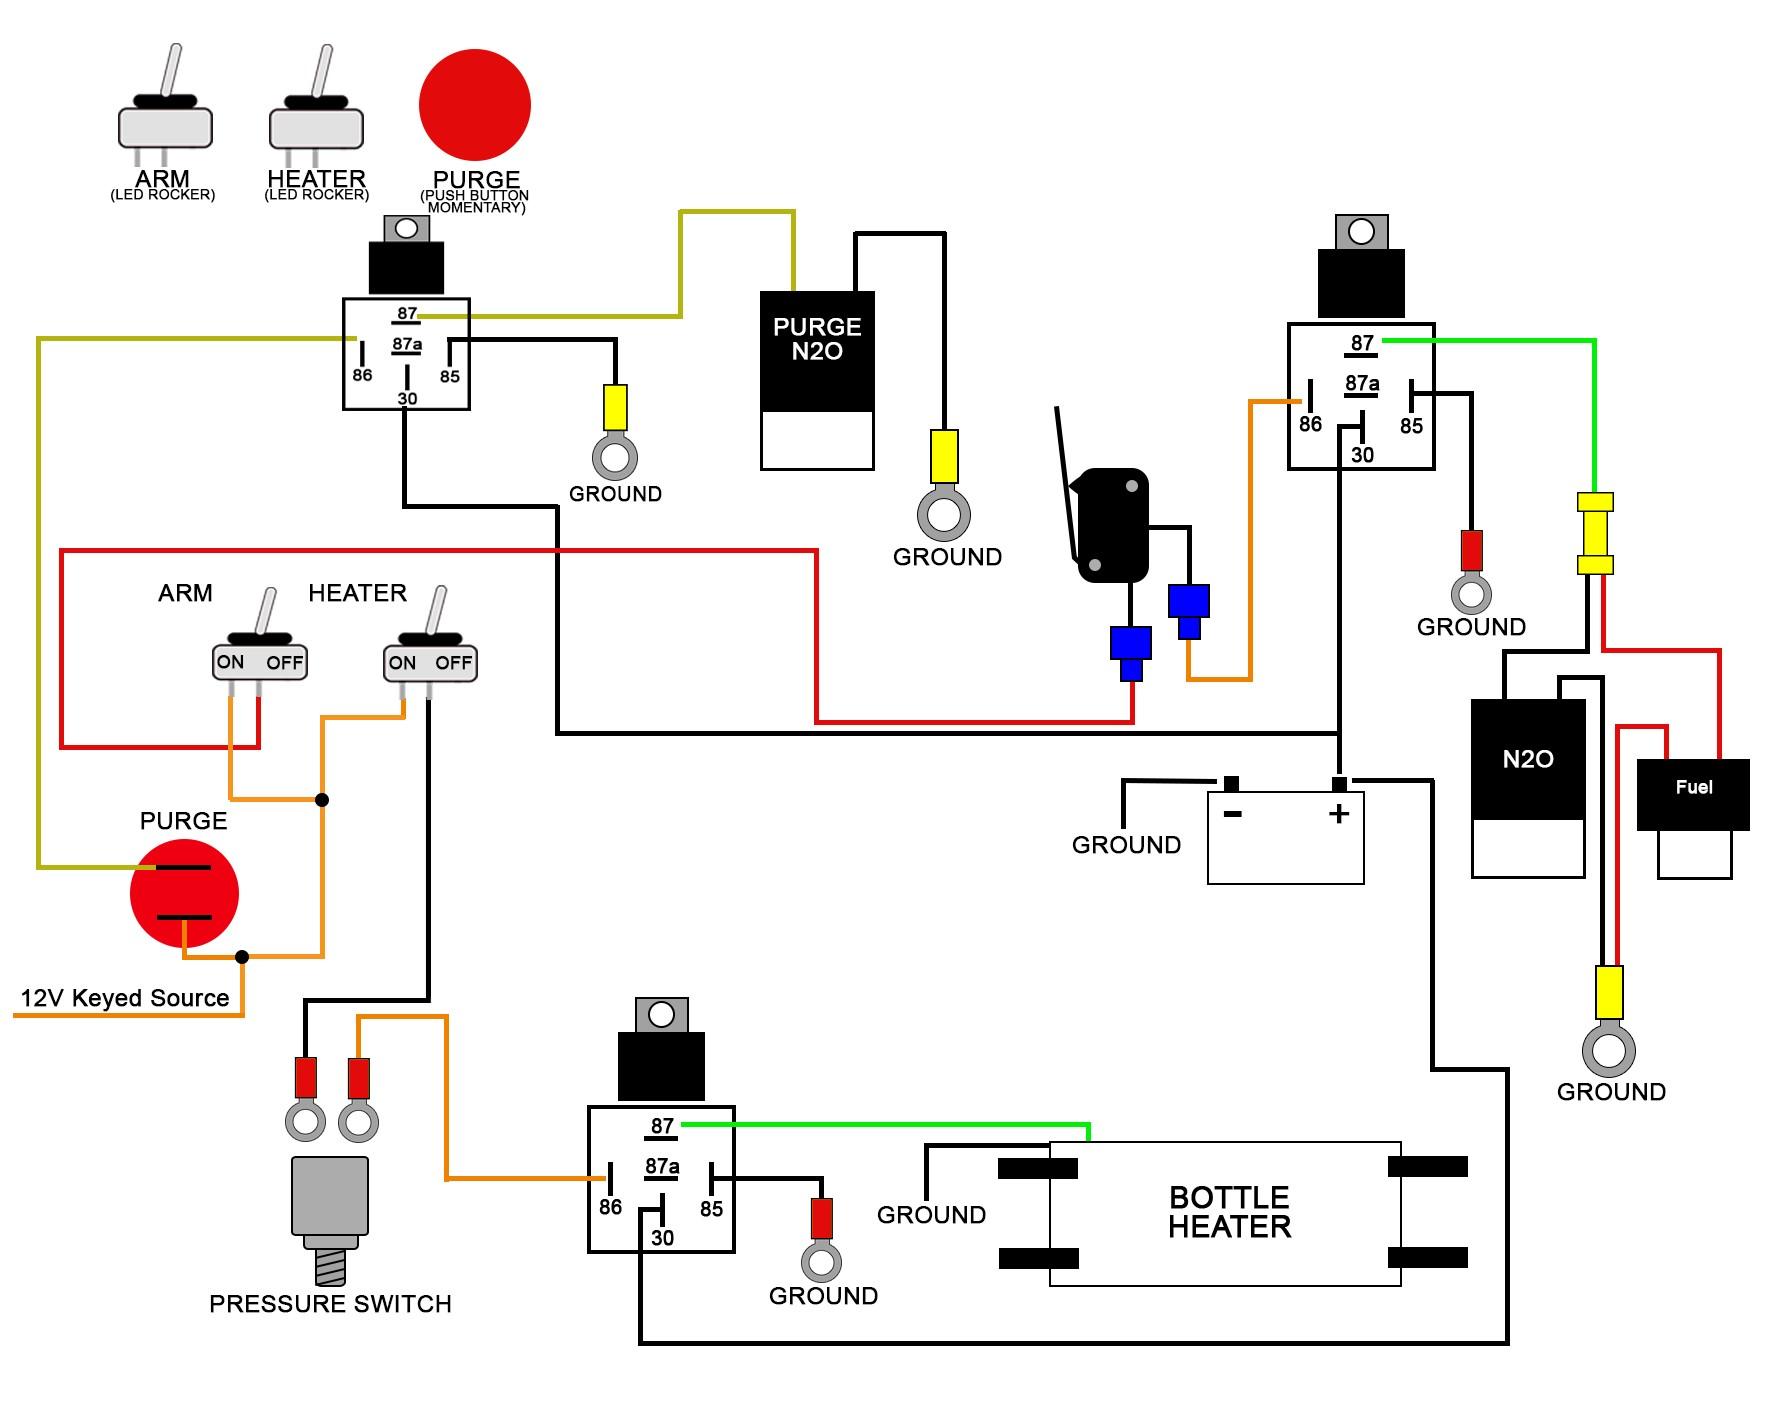 [DIAGRAM_4FR]  Car Wiring Diagrams App Wiring Diagram Oreck Xl2 -  upin-ipin.art-14.autoprestige-utilitaire.fr   Wiring Diagram Parallel Aw1004m      Wiring Diagram and Schematics